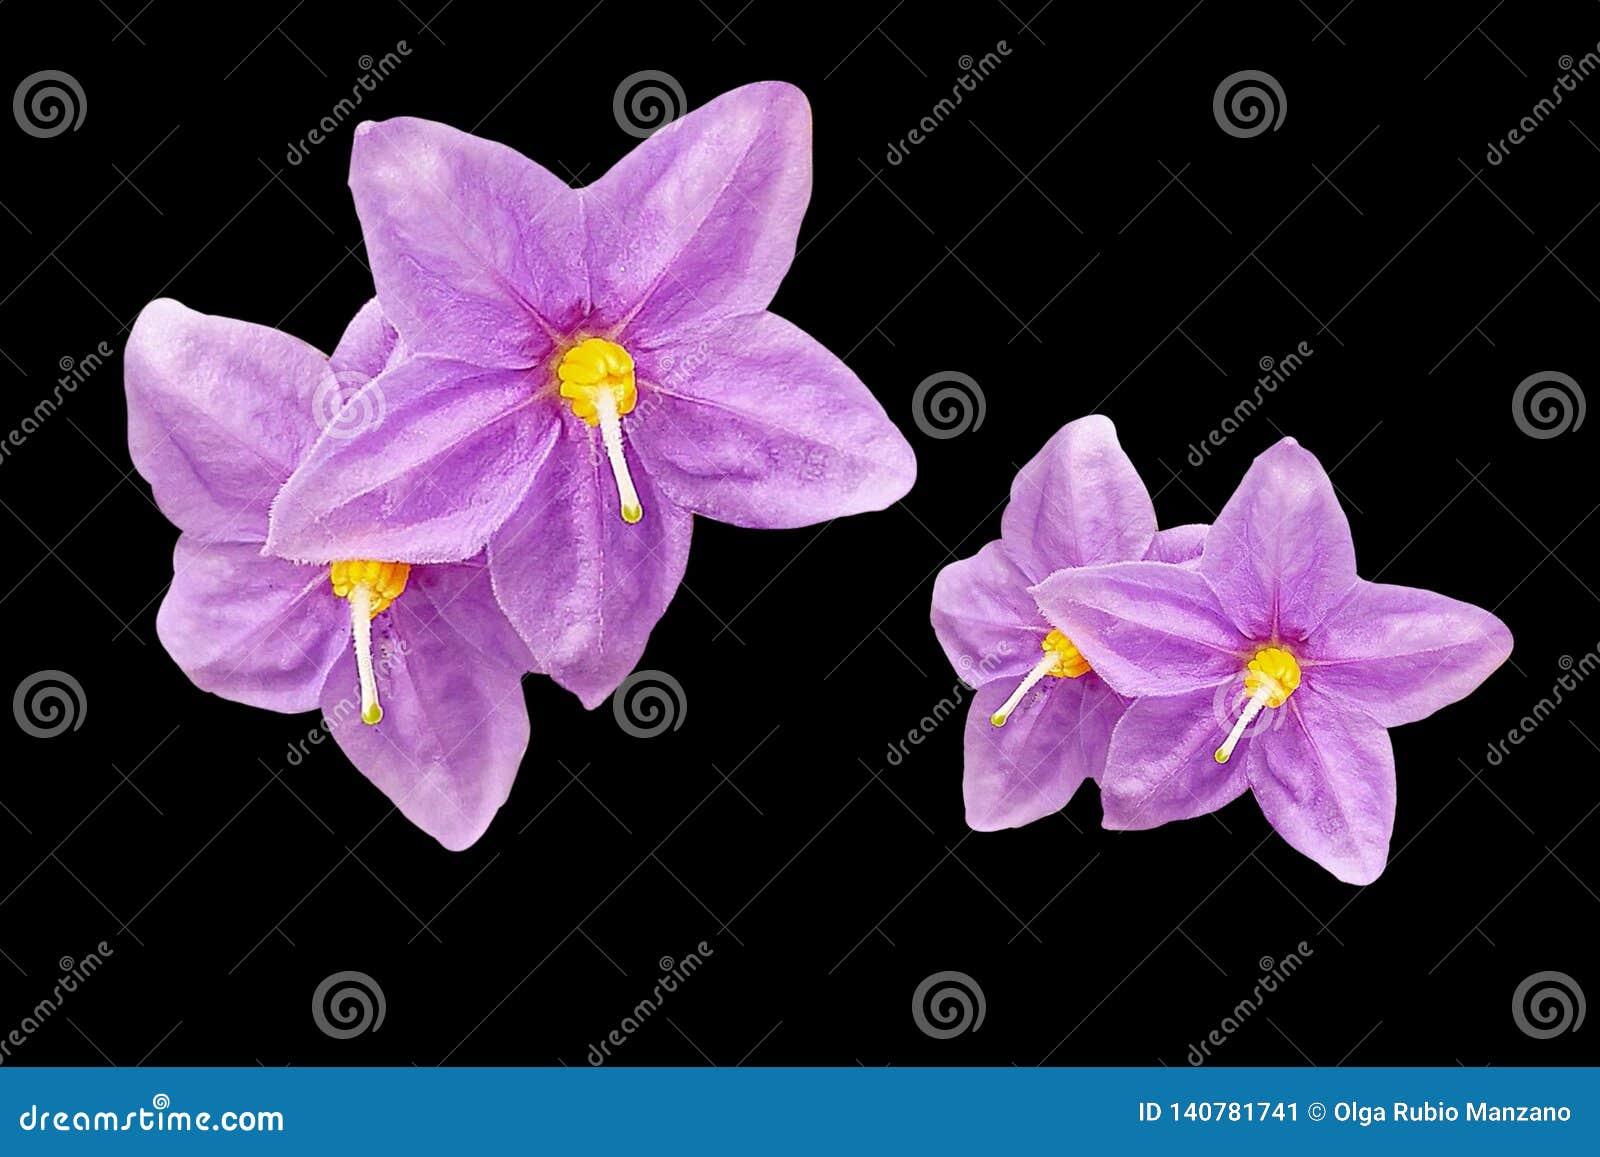 Purple flowers in black background